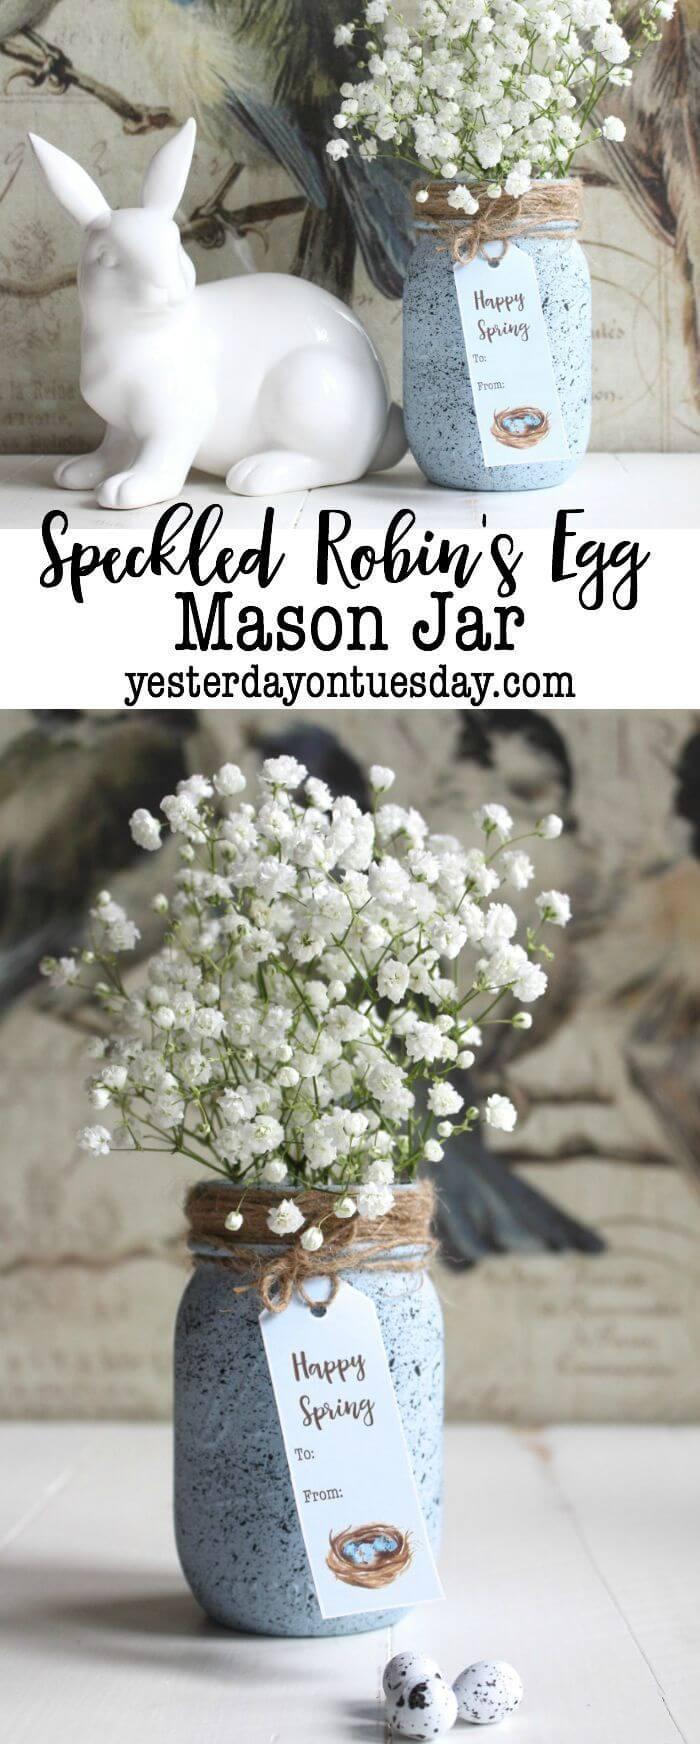 Mason Jars Speckled Like Robin's Eggs